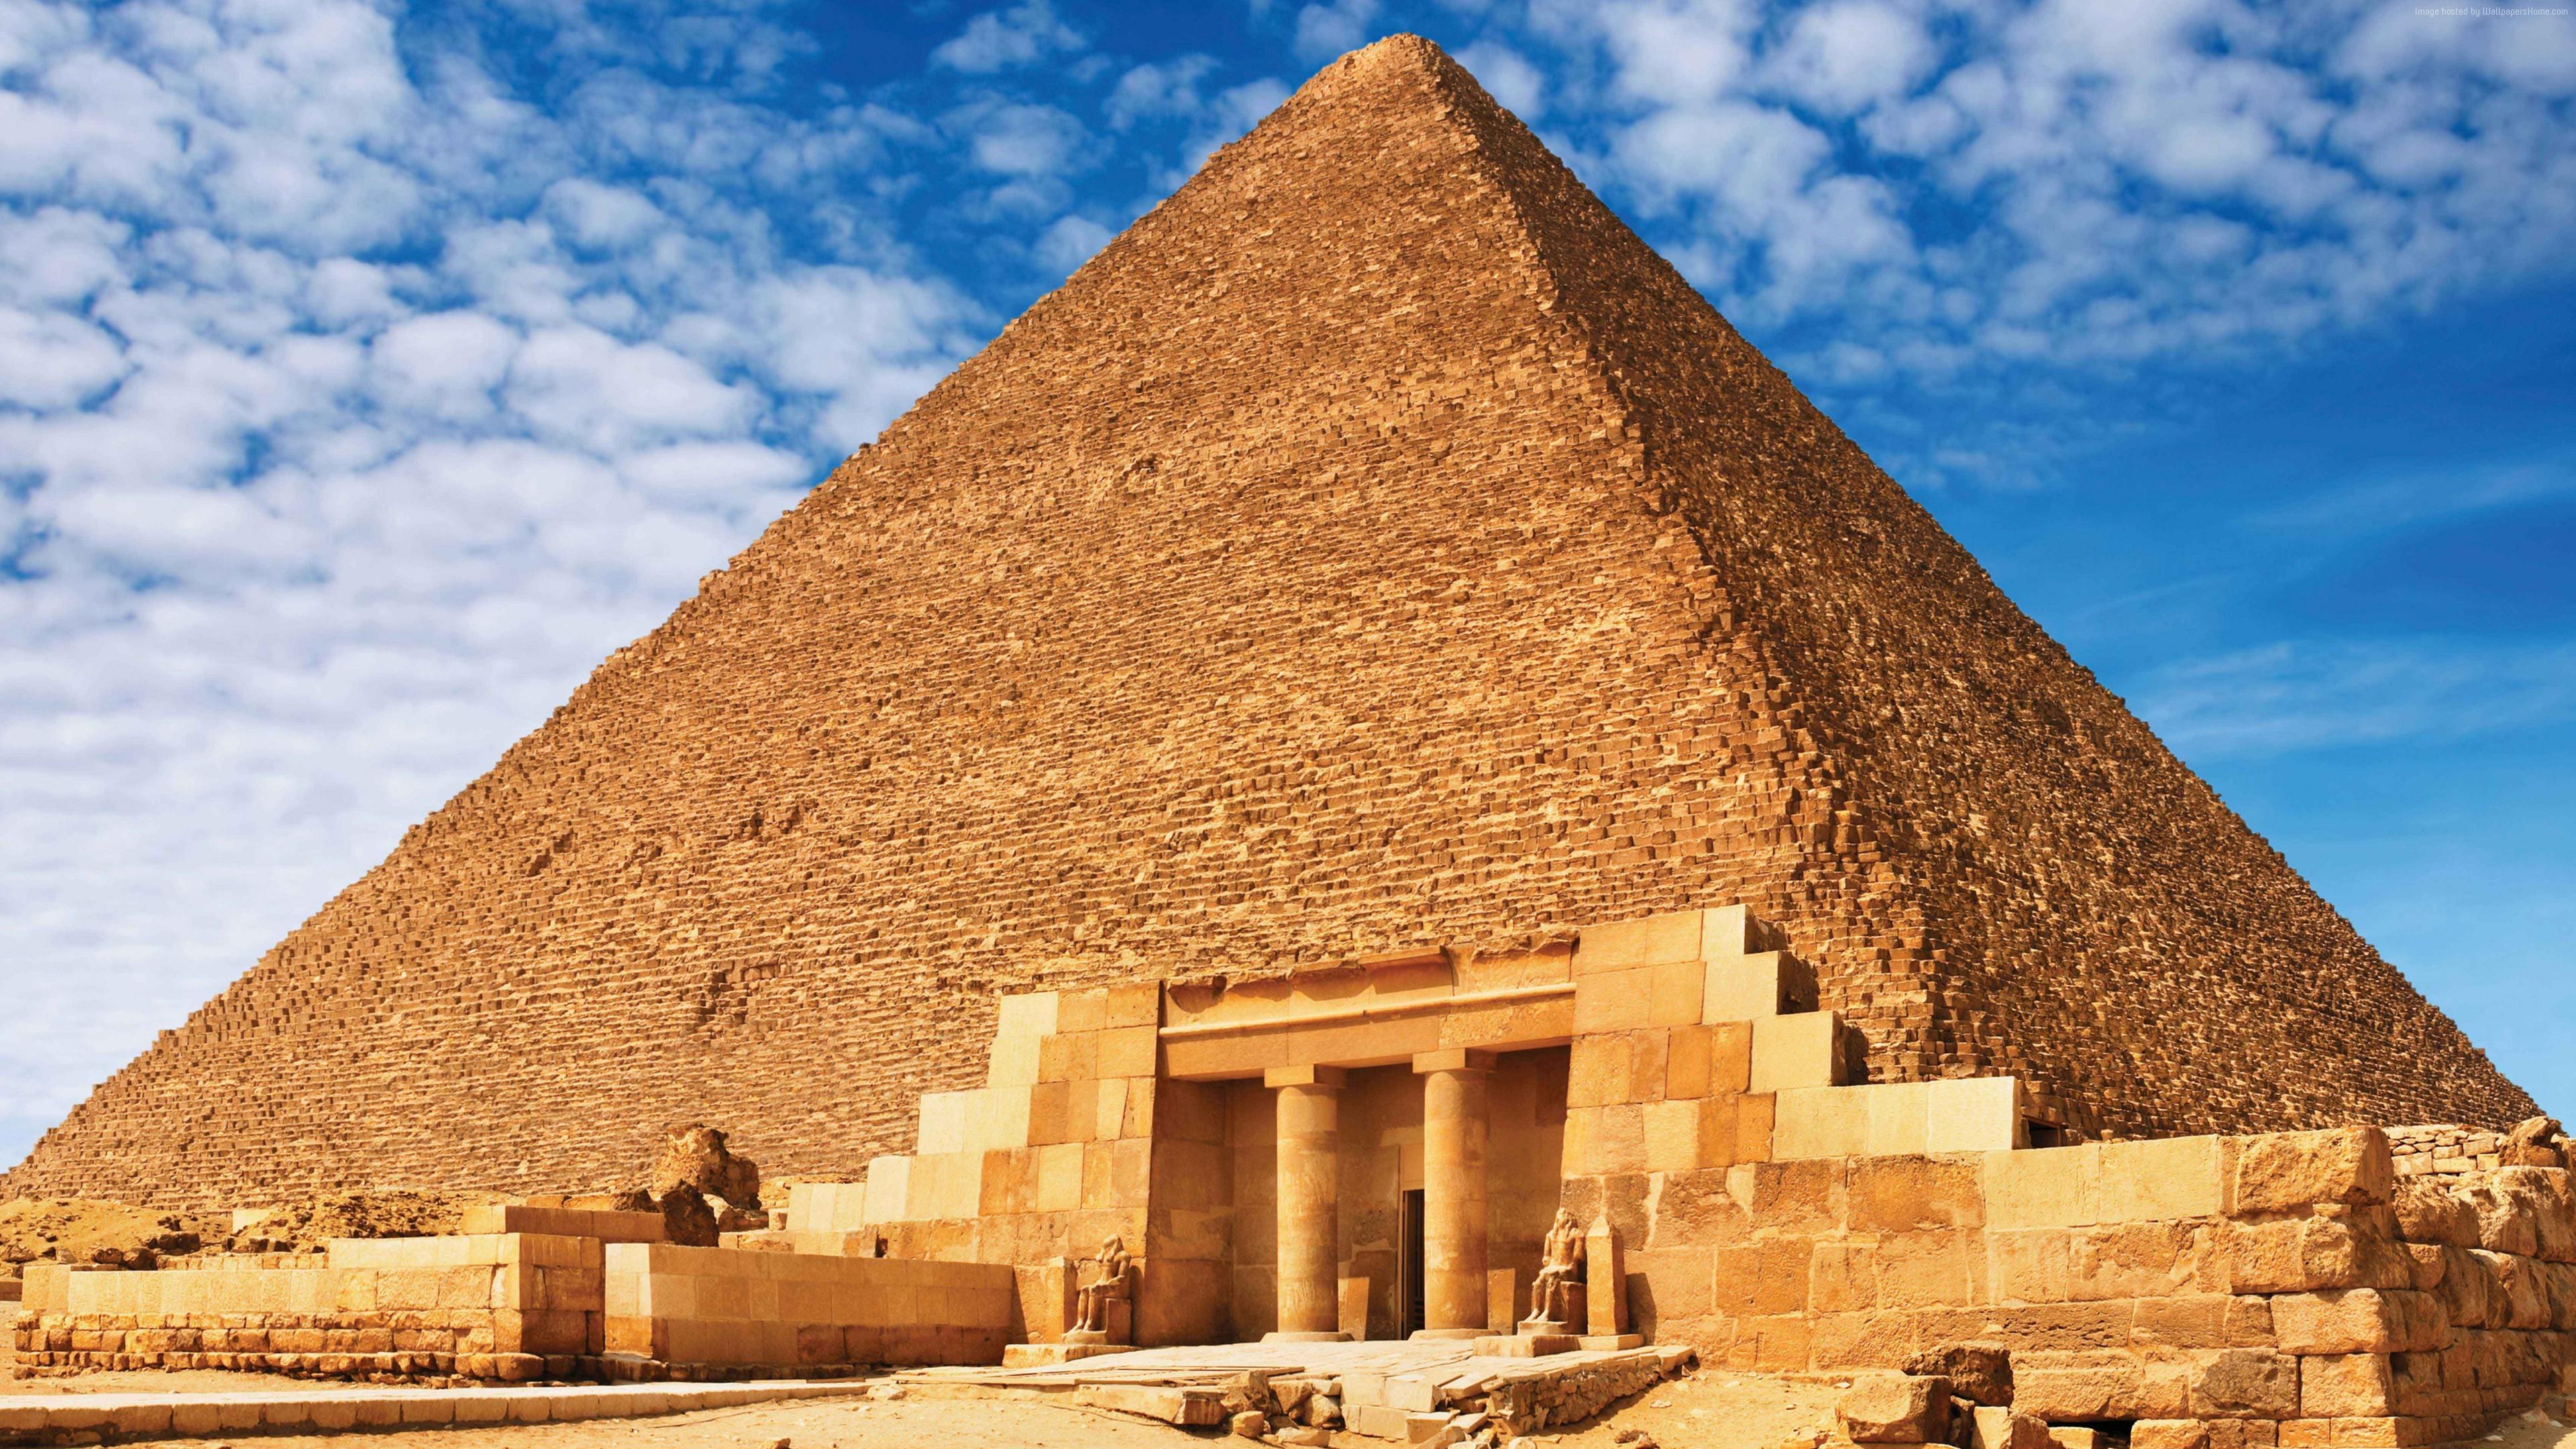 Wallpaper Egypt Pyramid 8k Travel Download